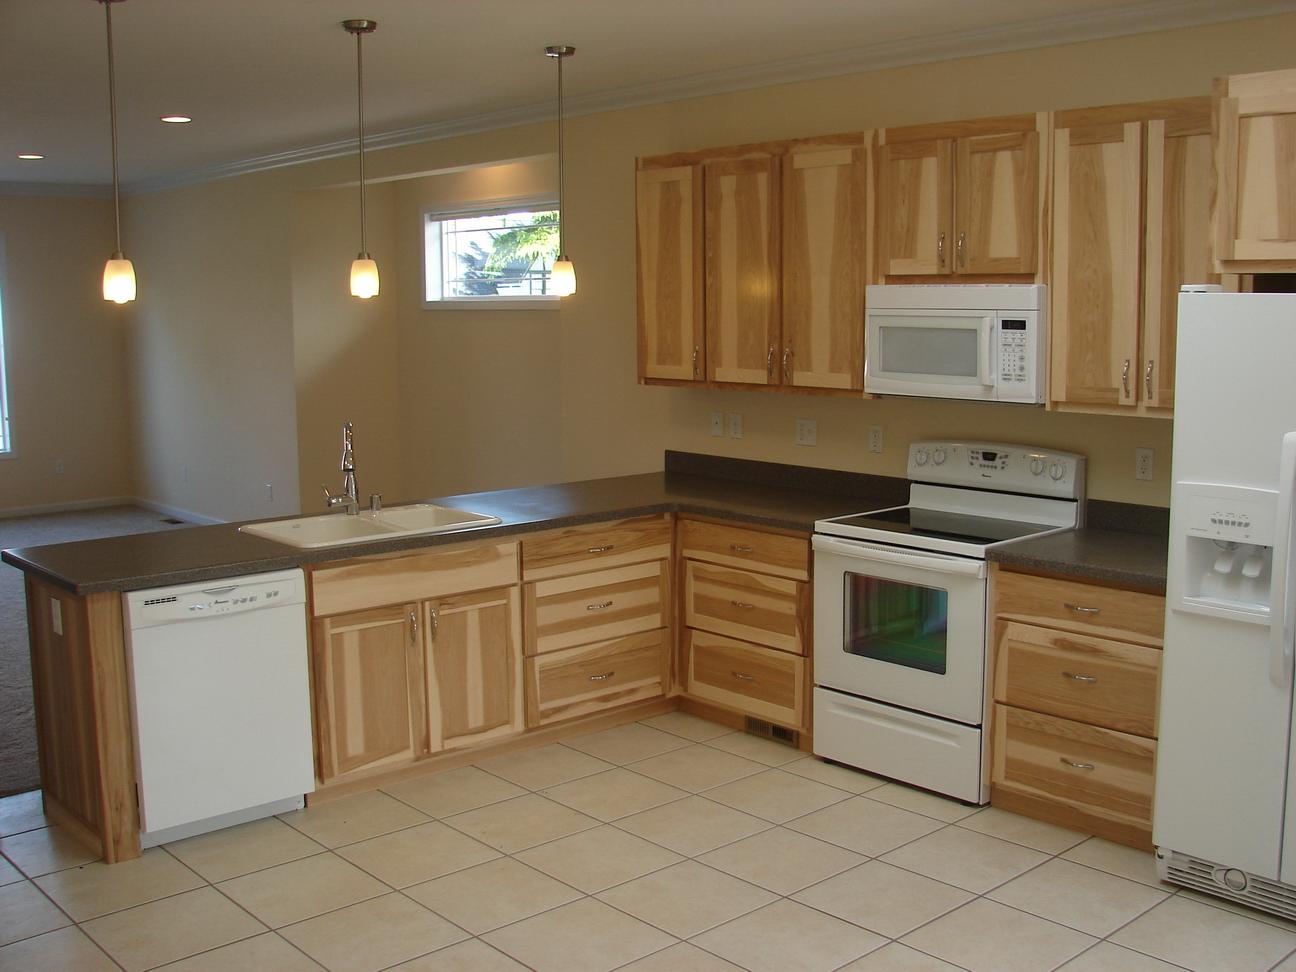 Home - Custom Cabinets, Kitchens, Baths, Custom Furnitures ...